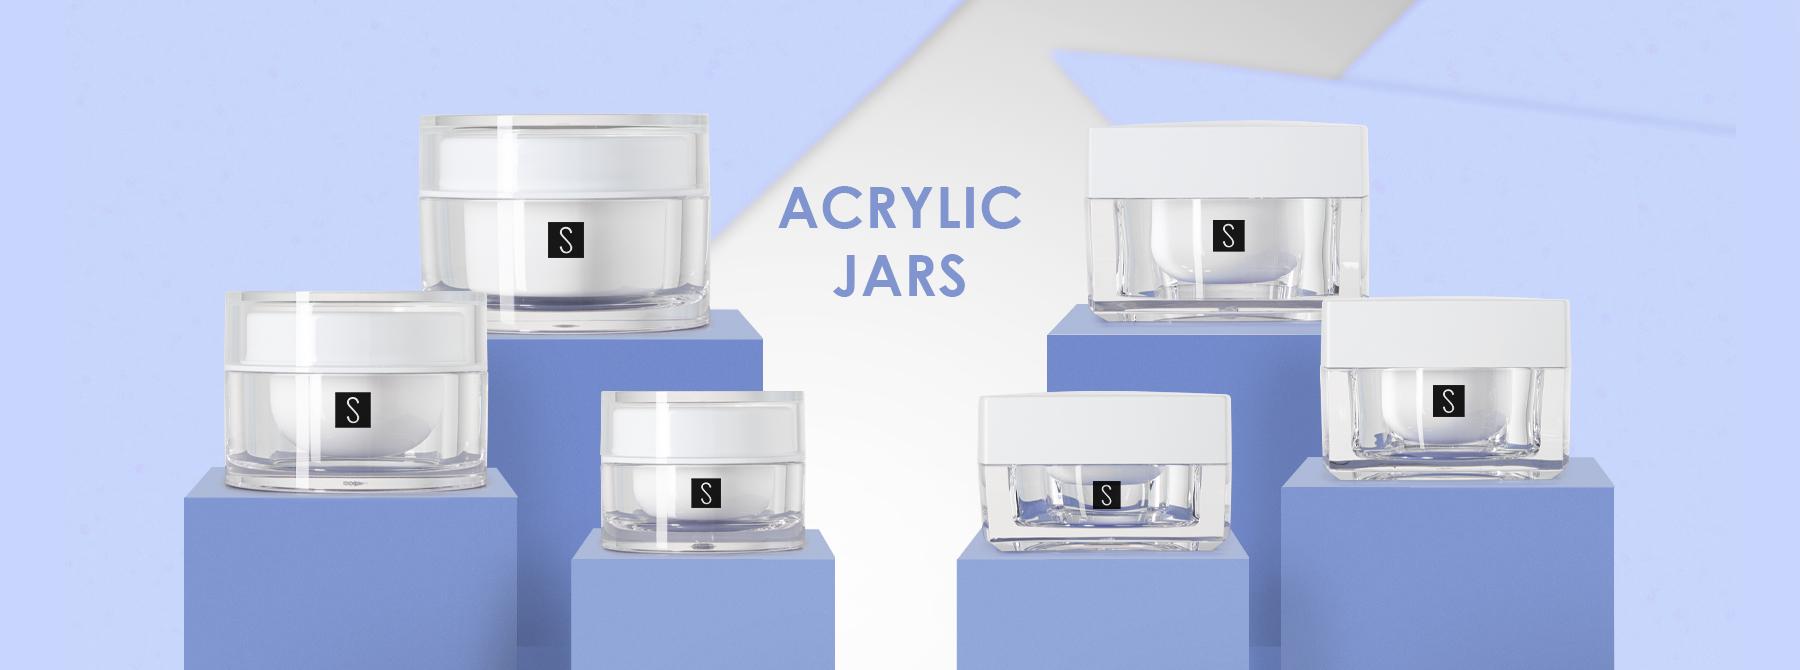 Acrylic-Jars